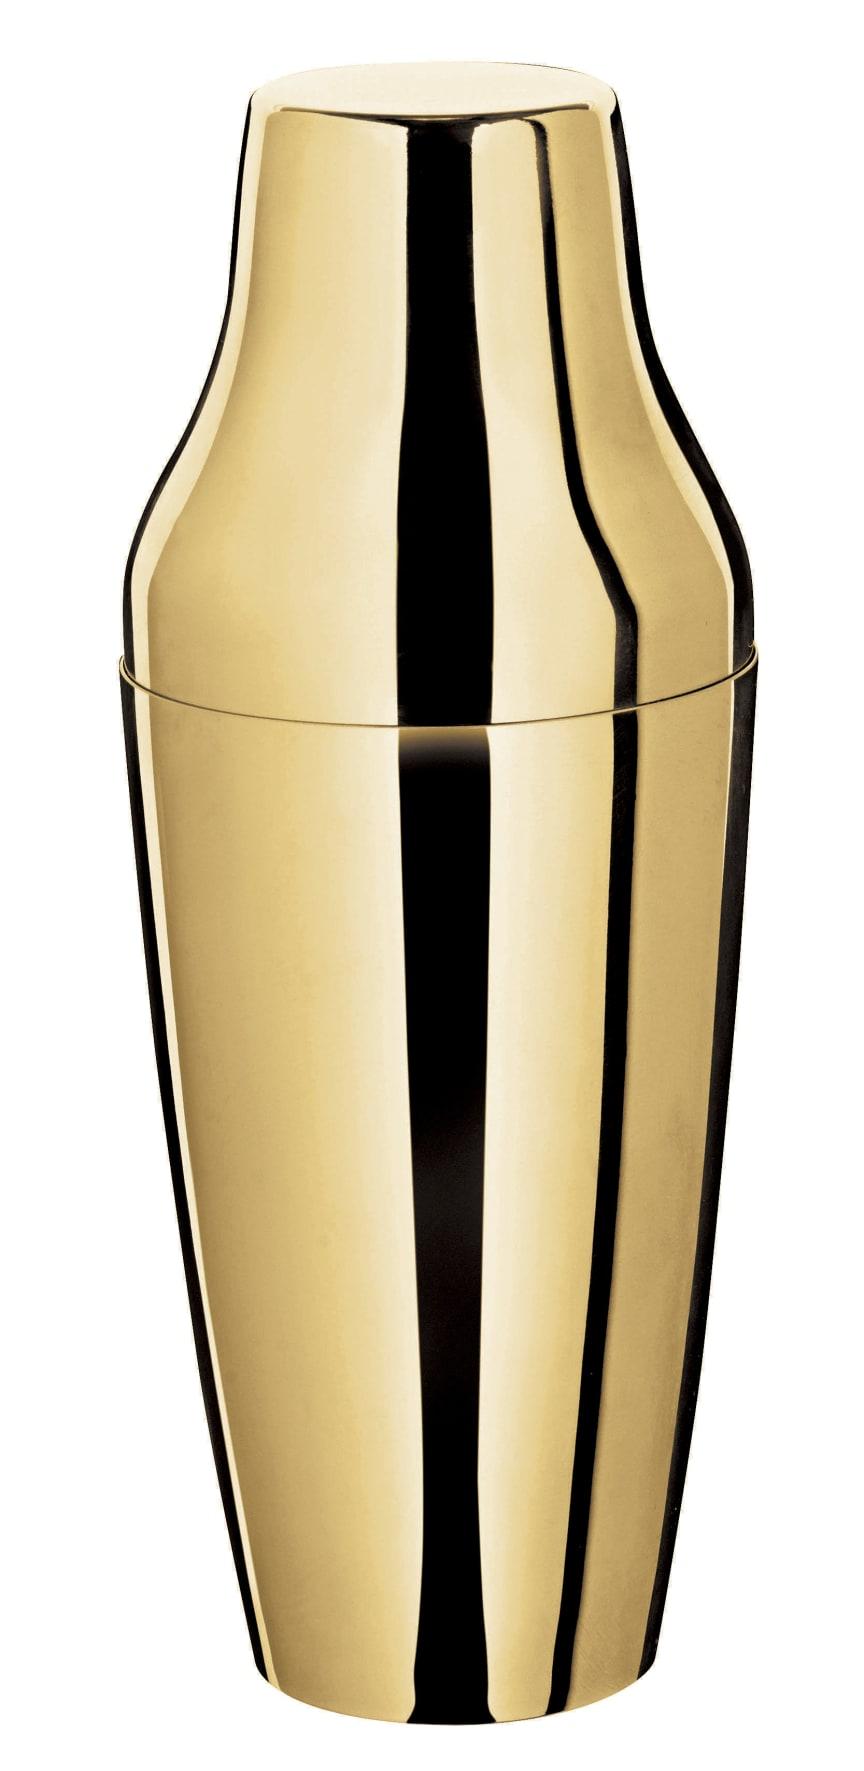 SBT_Bar_Selection_PVD_Cognac_French_Shaker